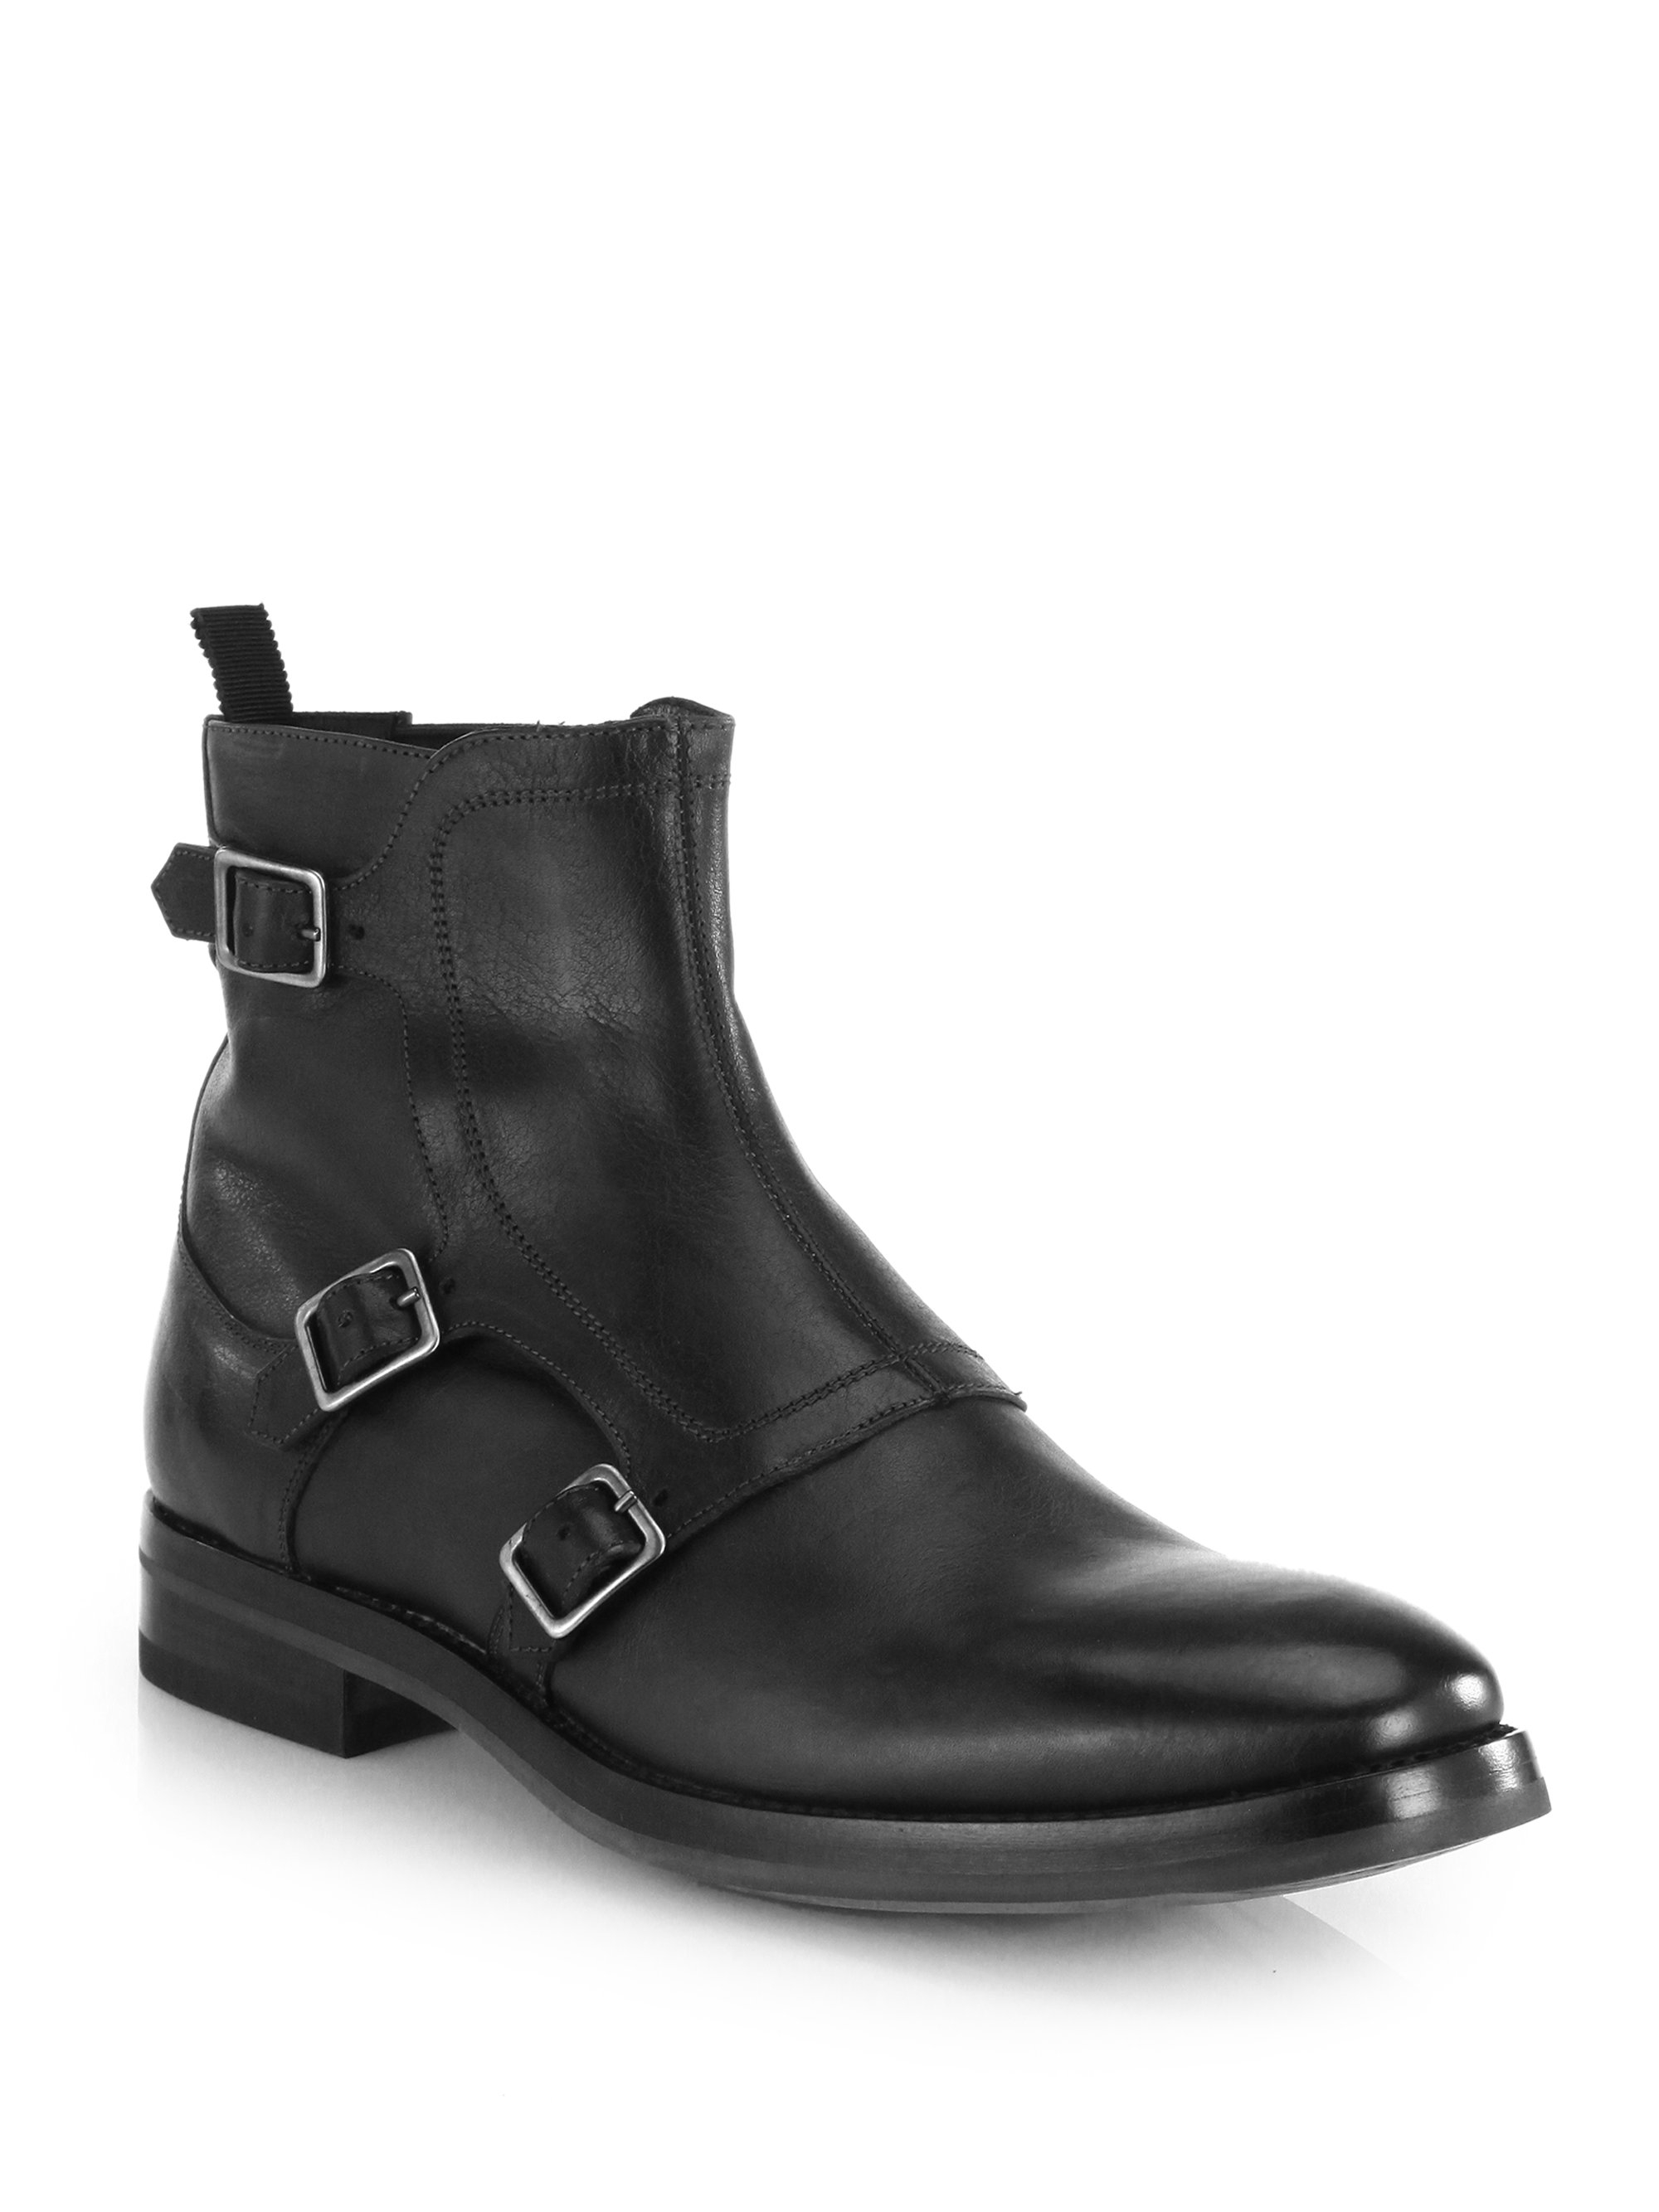 Alexander Mcqueen Triple Monk Strap Boots In Black For Men